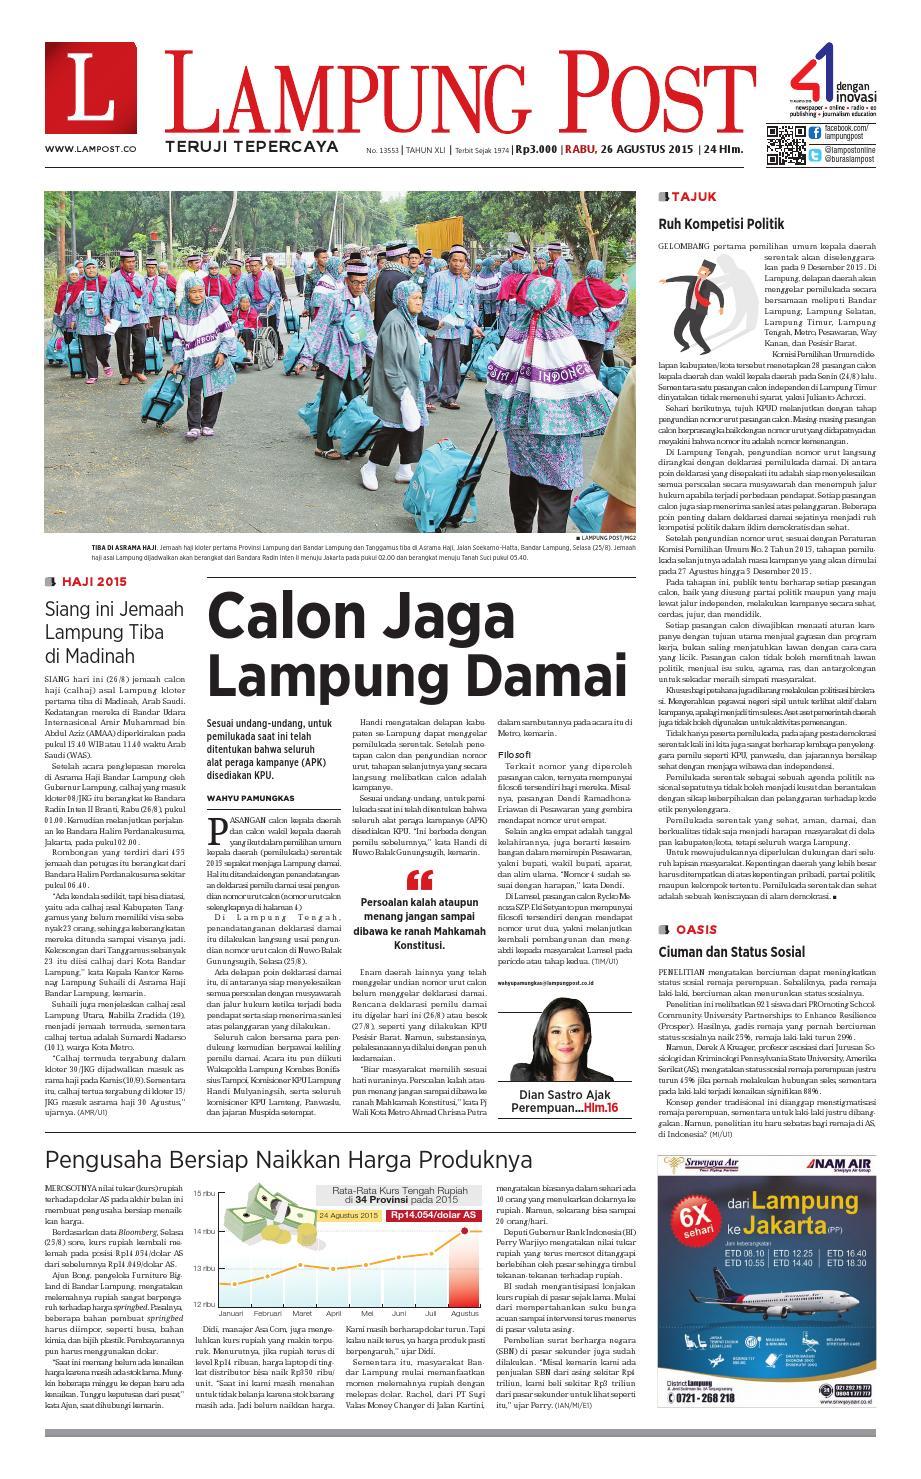 Lampung Post Rabu 26 Agustus 2015 By Issuu Produk Ukm Bumn Tekiro Tang Buaya 10